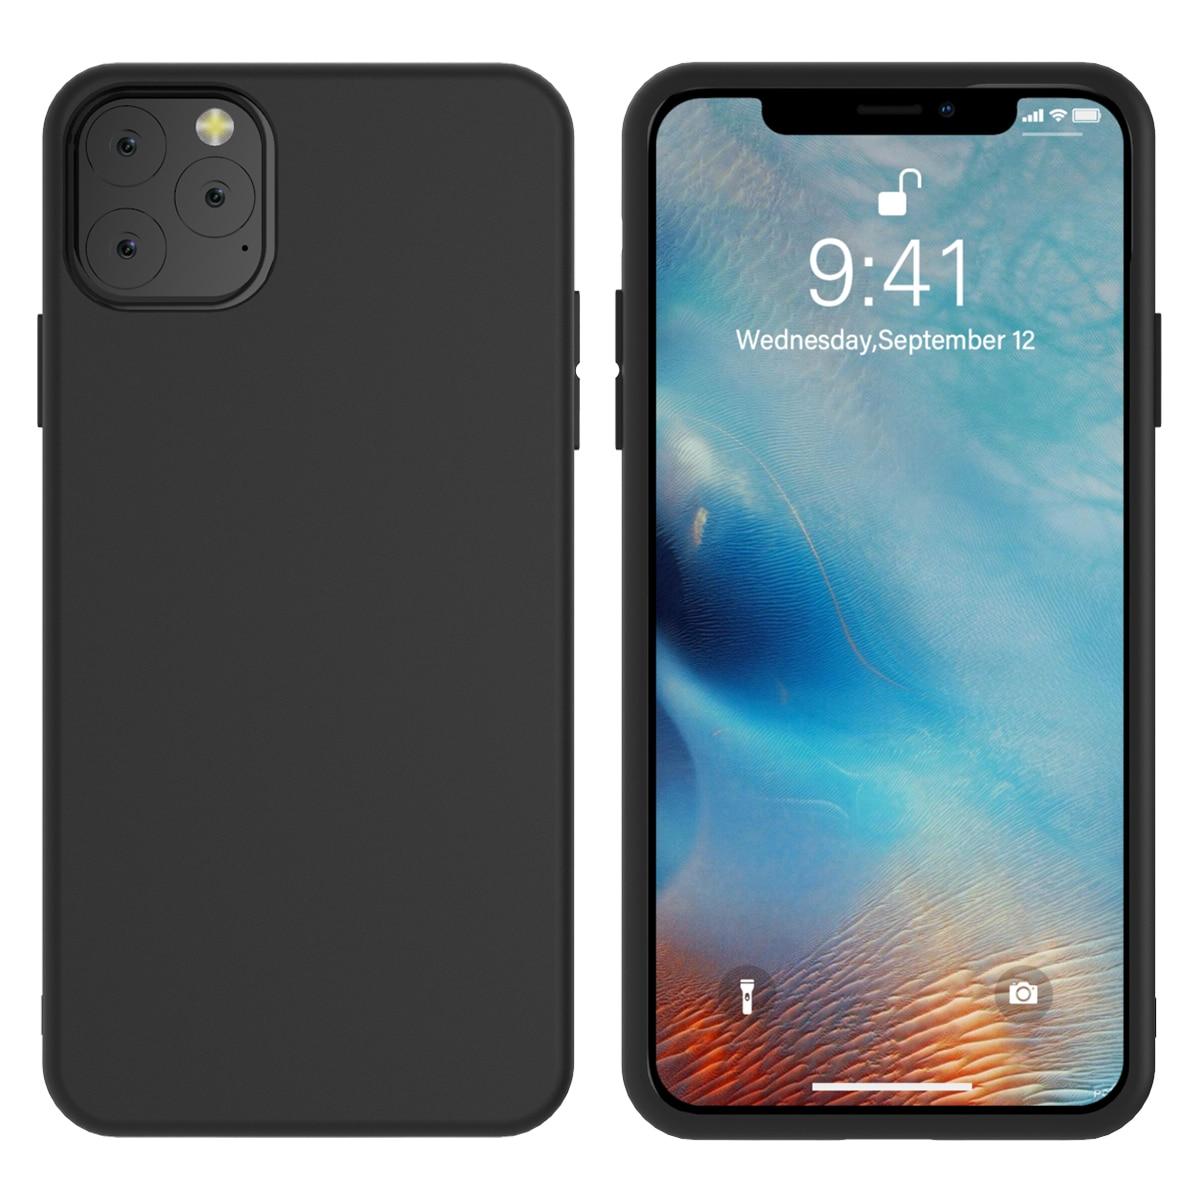 Torubia Silicone Case for iPhone 11/11 Pro/11 Pro Max 42